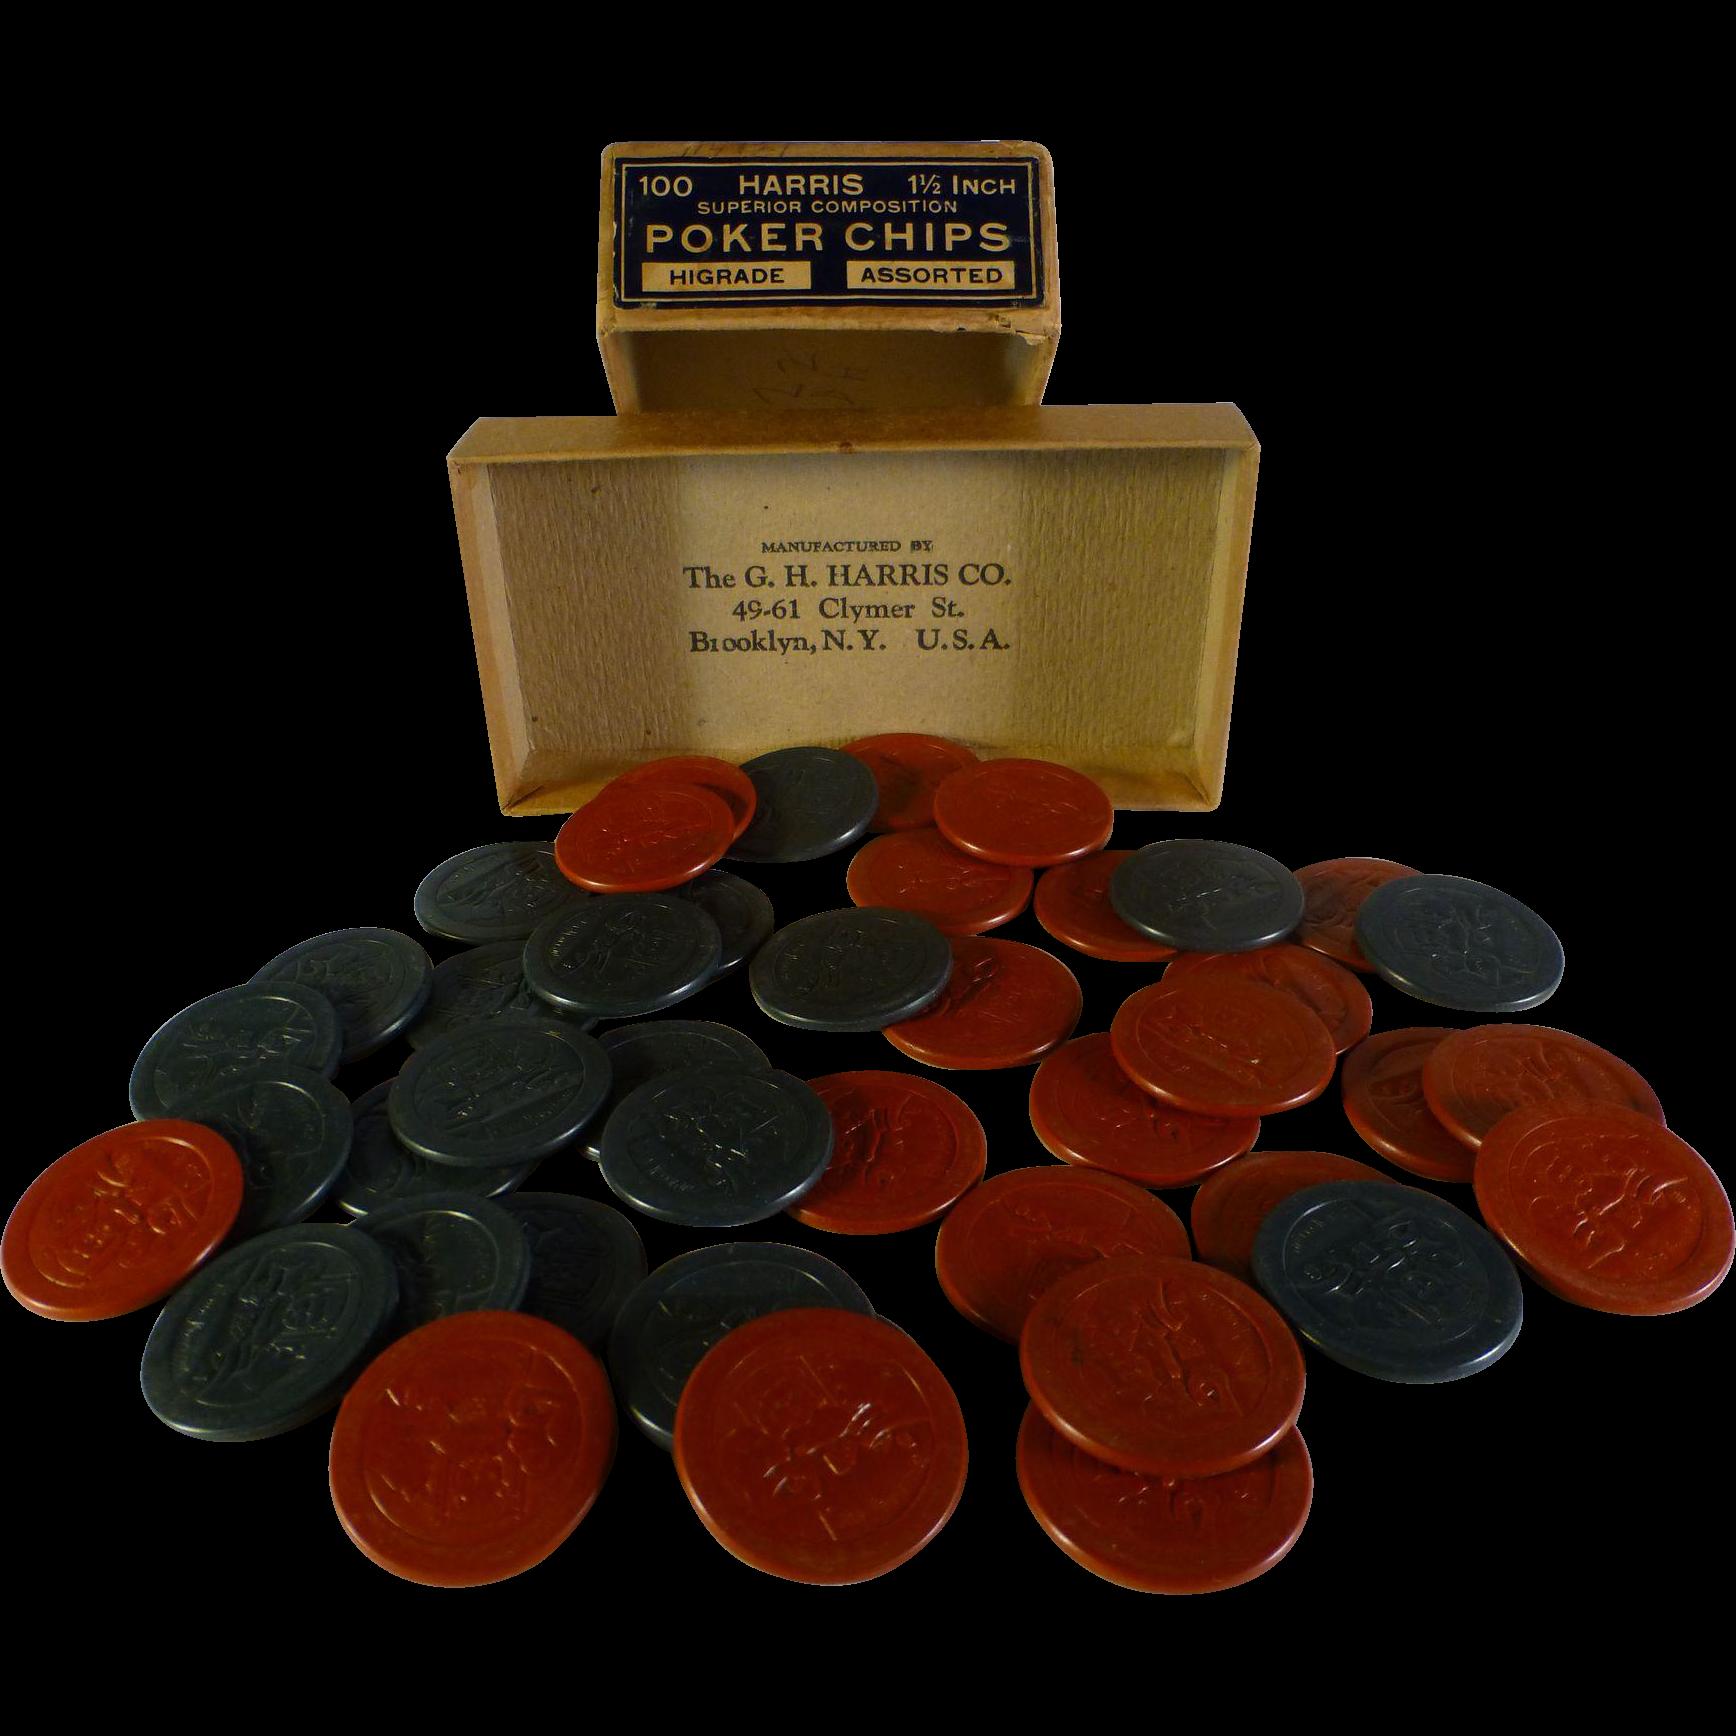 Remington poker chips